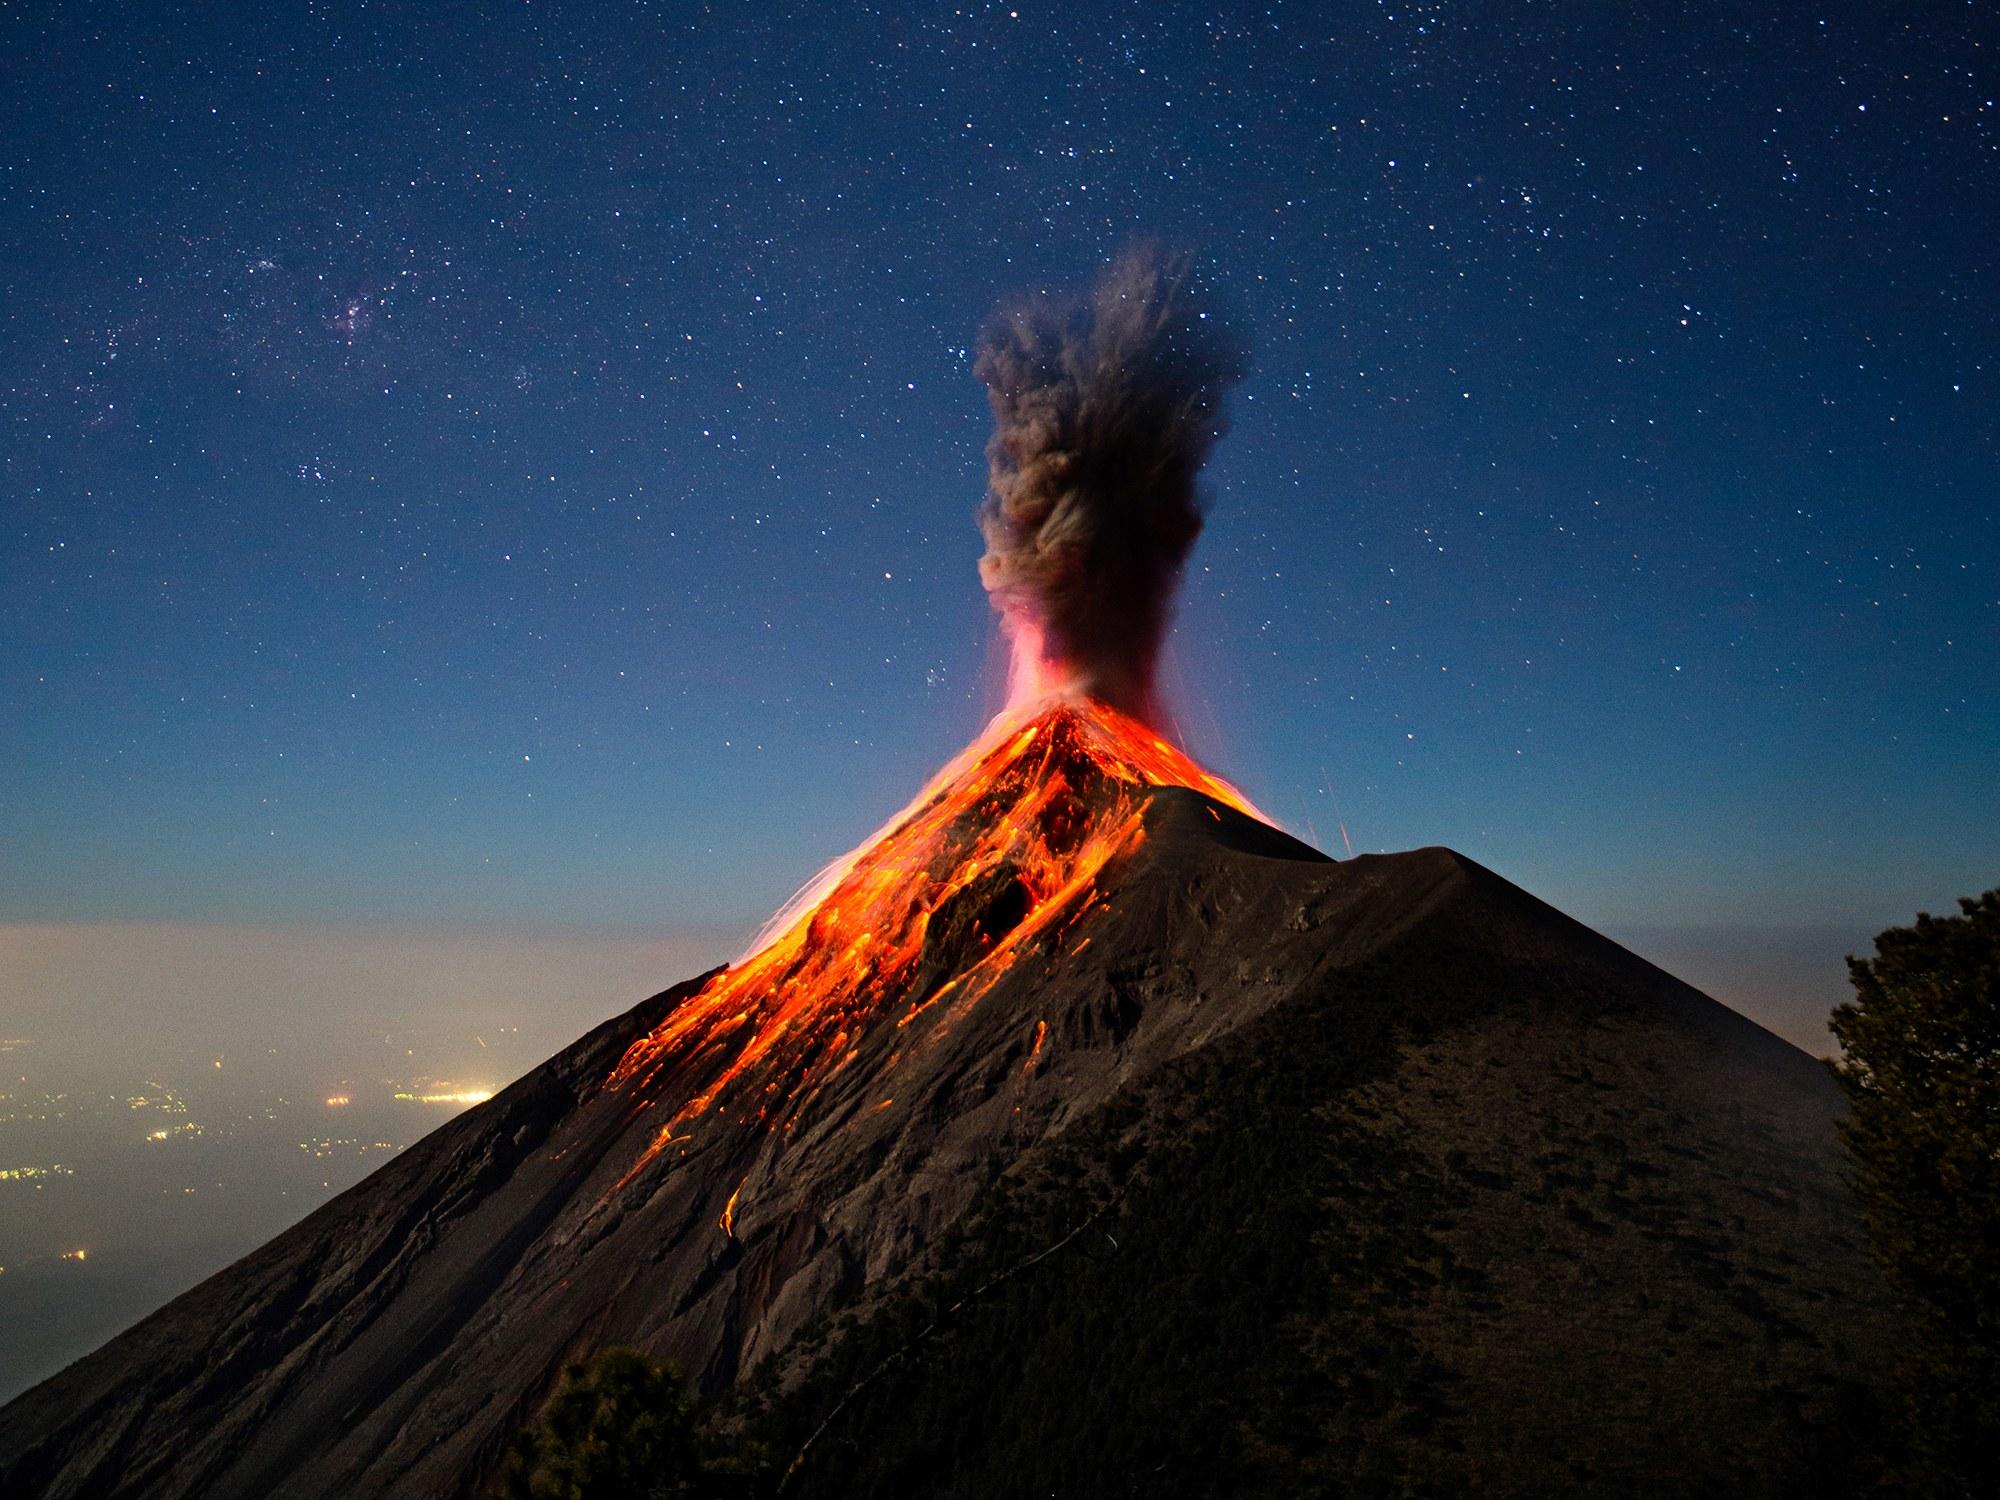 Volcano clipart high re Wallpaper Definition Nature Wallpaper: Diagram